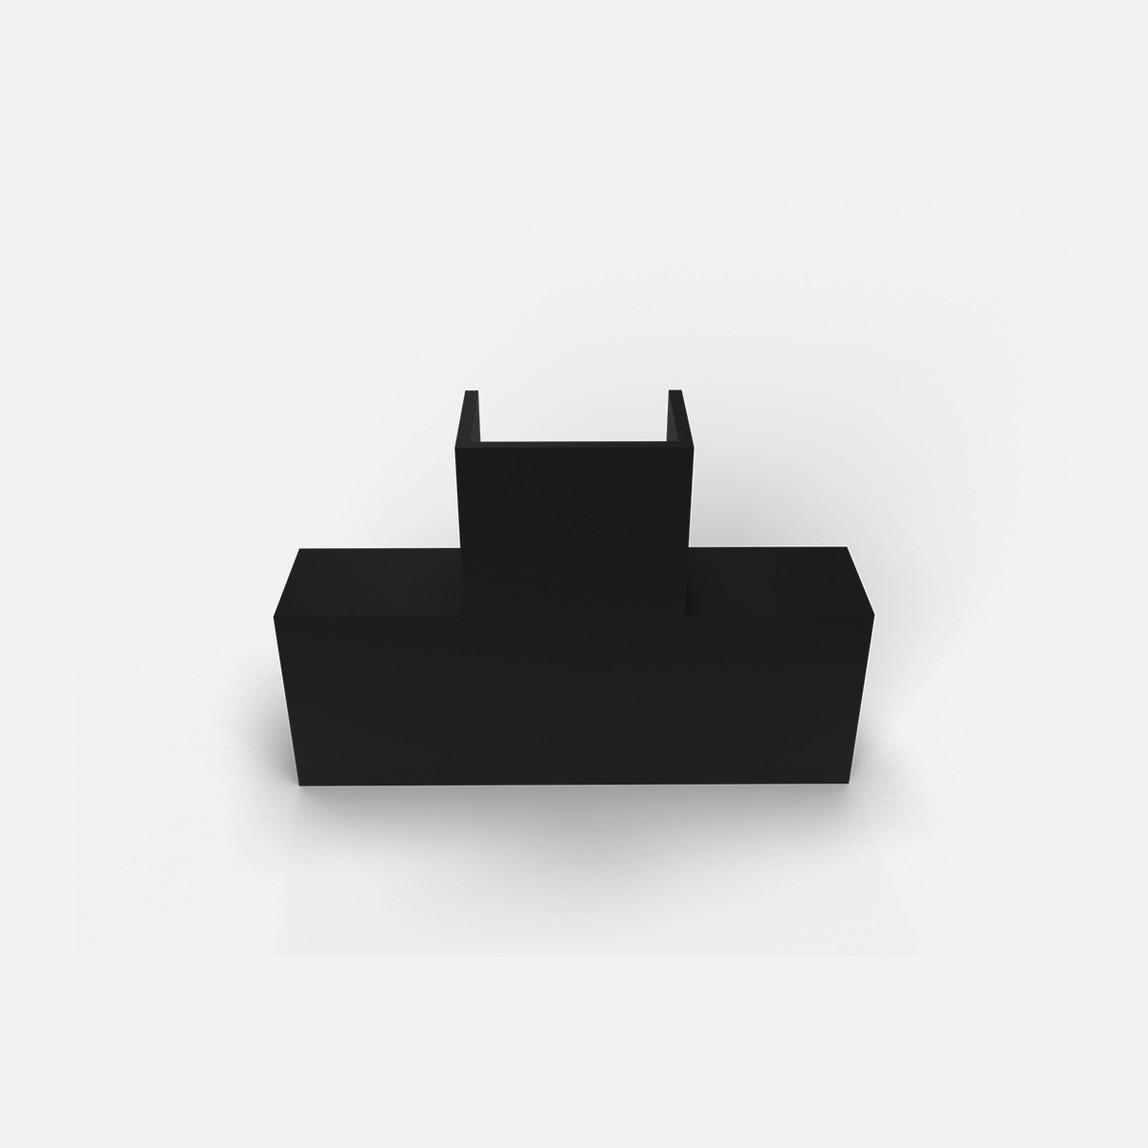 25X16 T-L Köşe Siyah